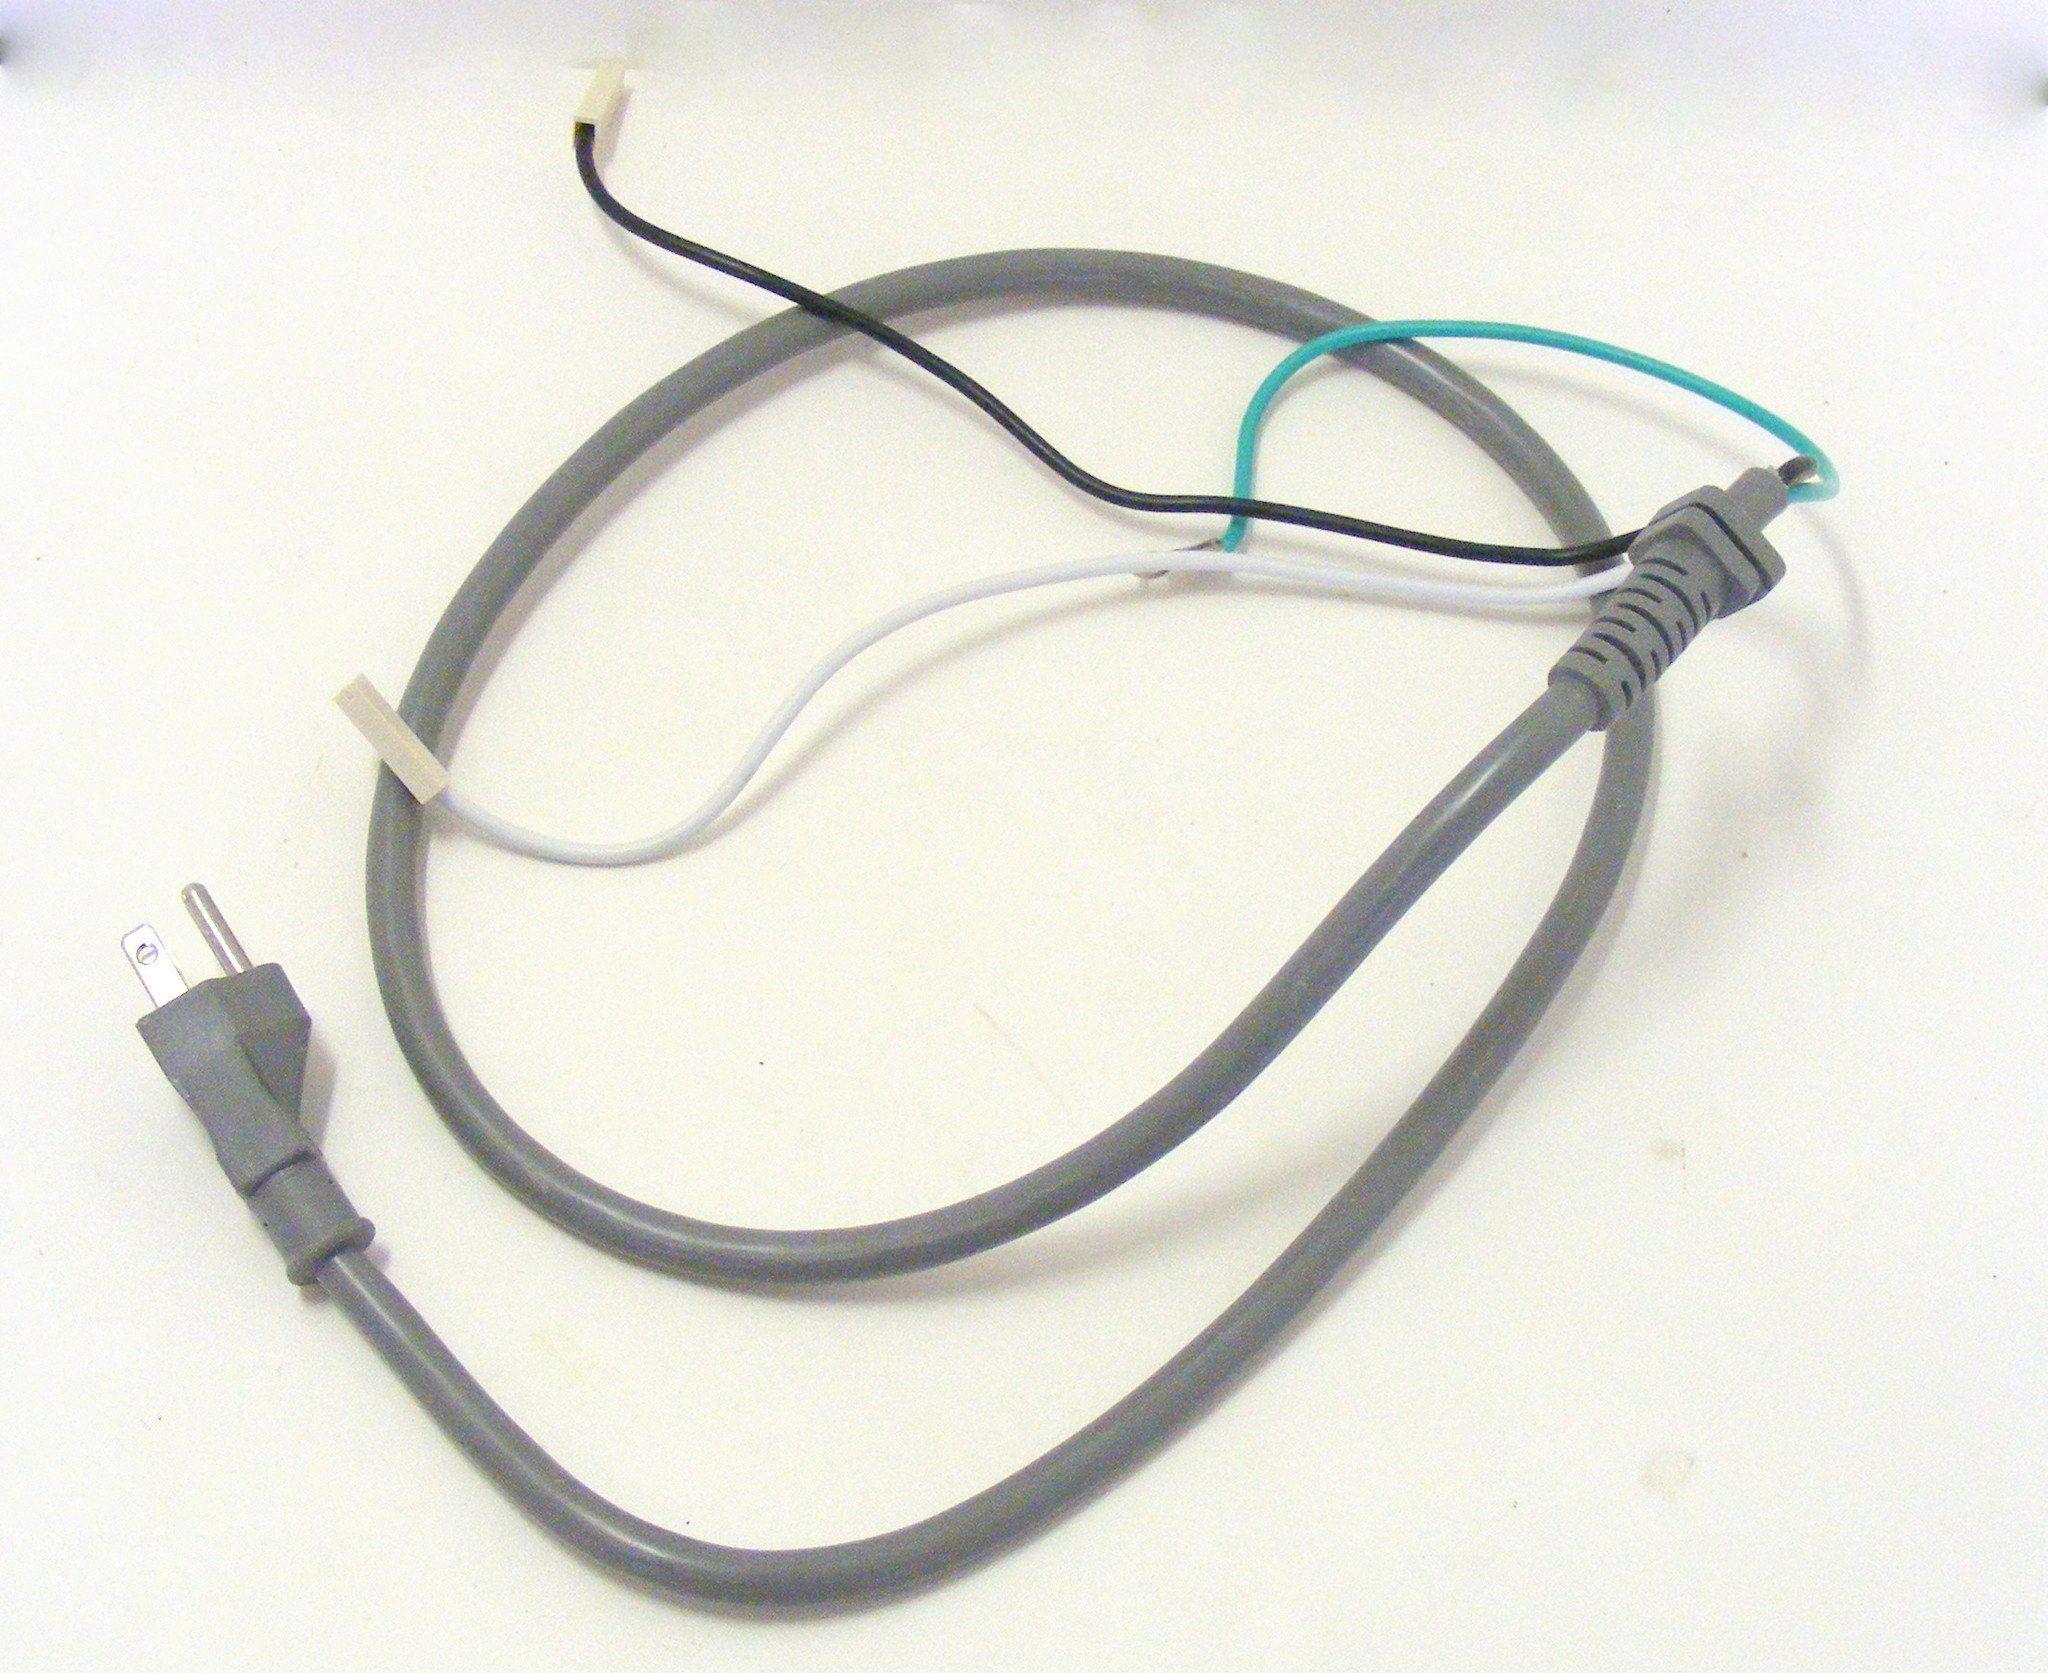 5304464890 New Frigidaire Microwave Power Cord Appliance Parts Power Cord Best Appliances